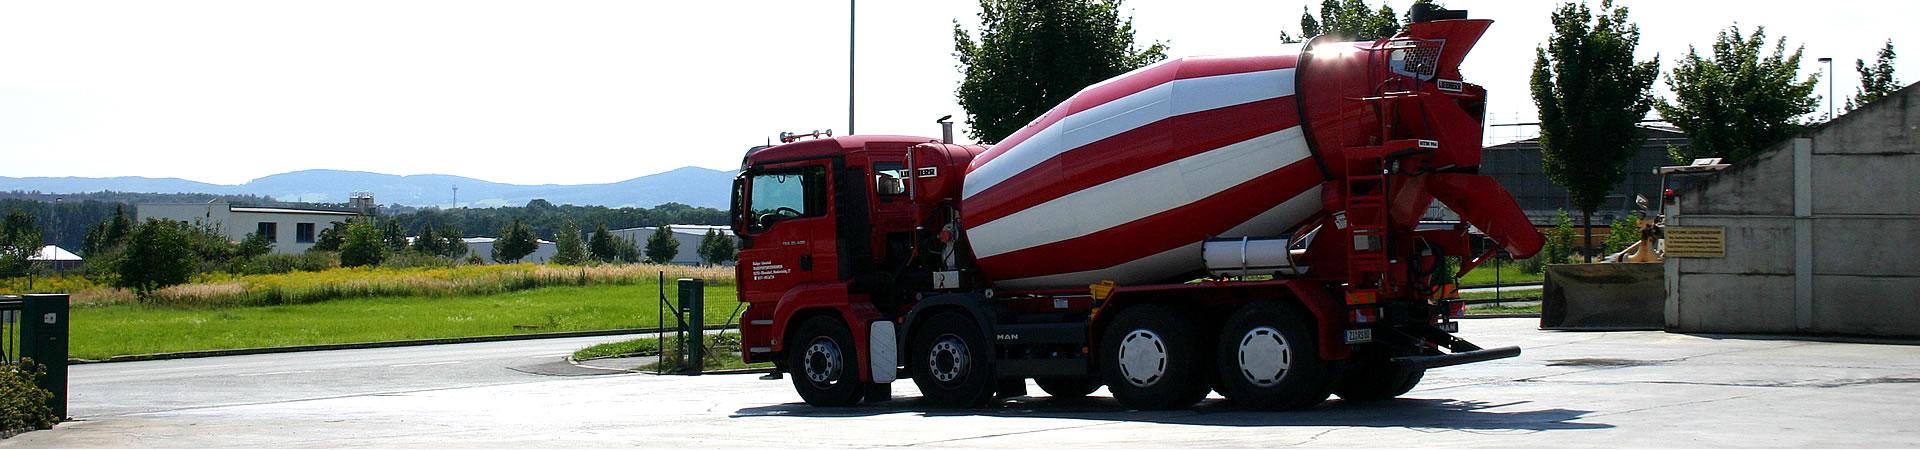 Prächtig Preislisten Transportbeton | Betonpumpen | Zement | Anhängerpumpen &VF_22